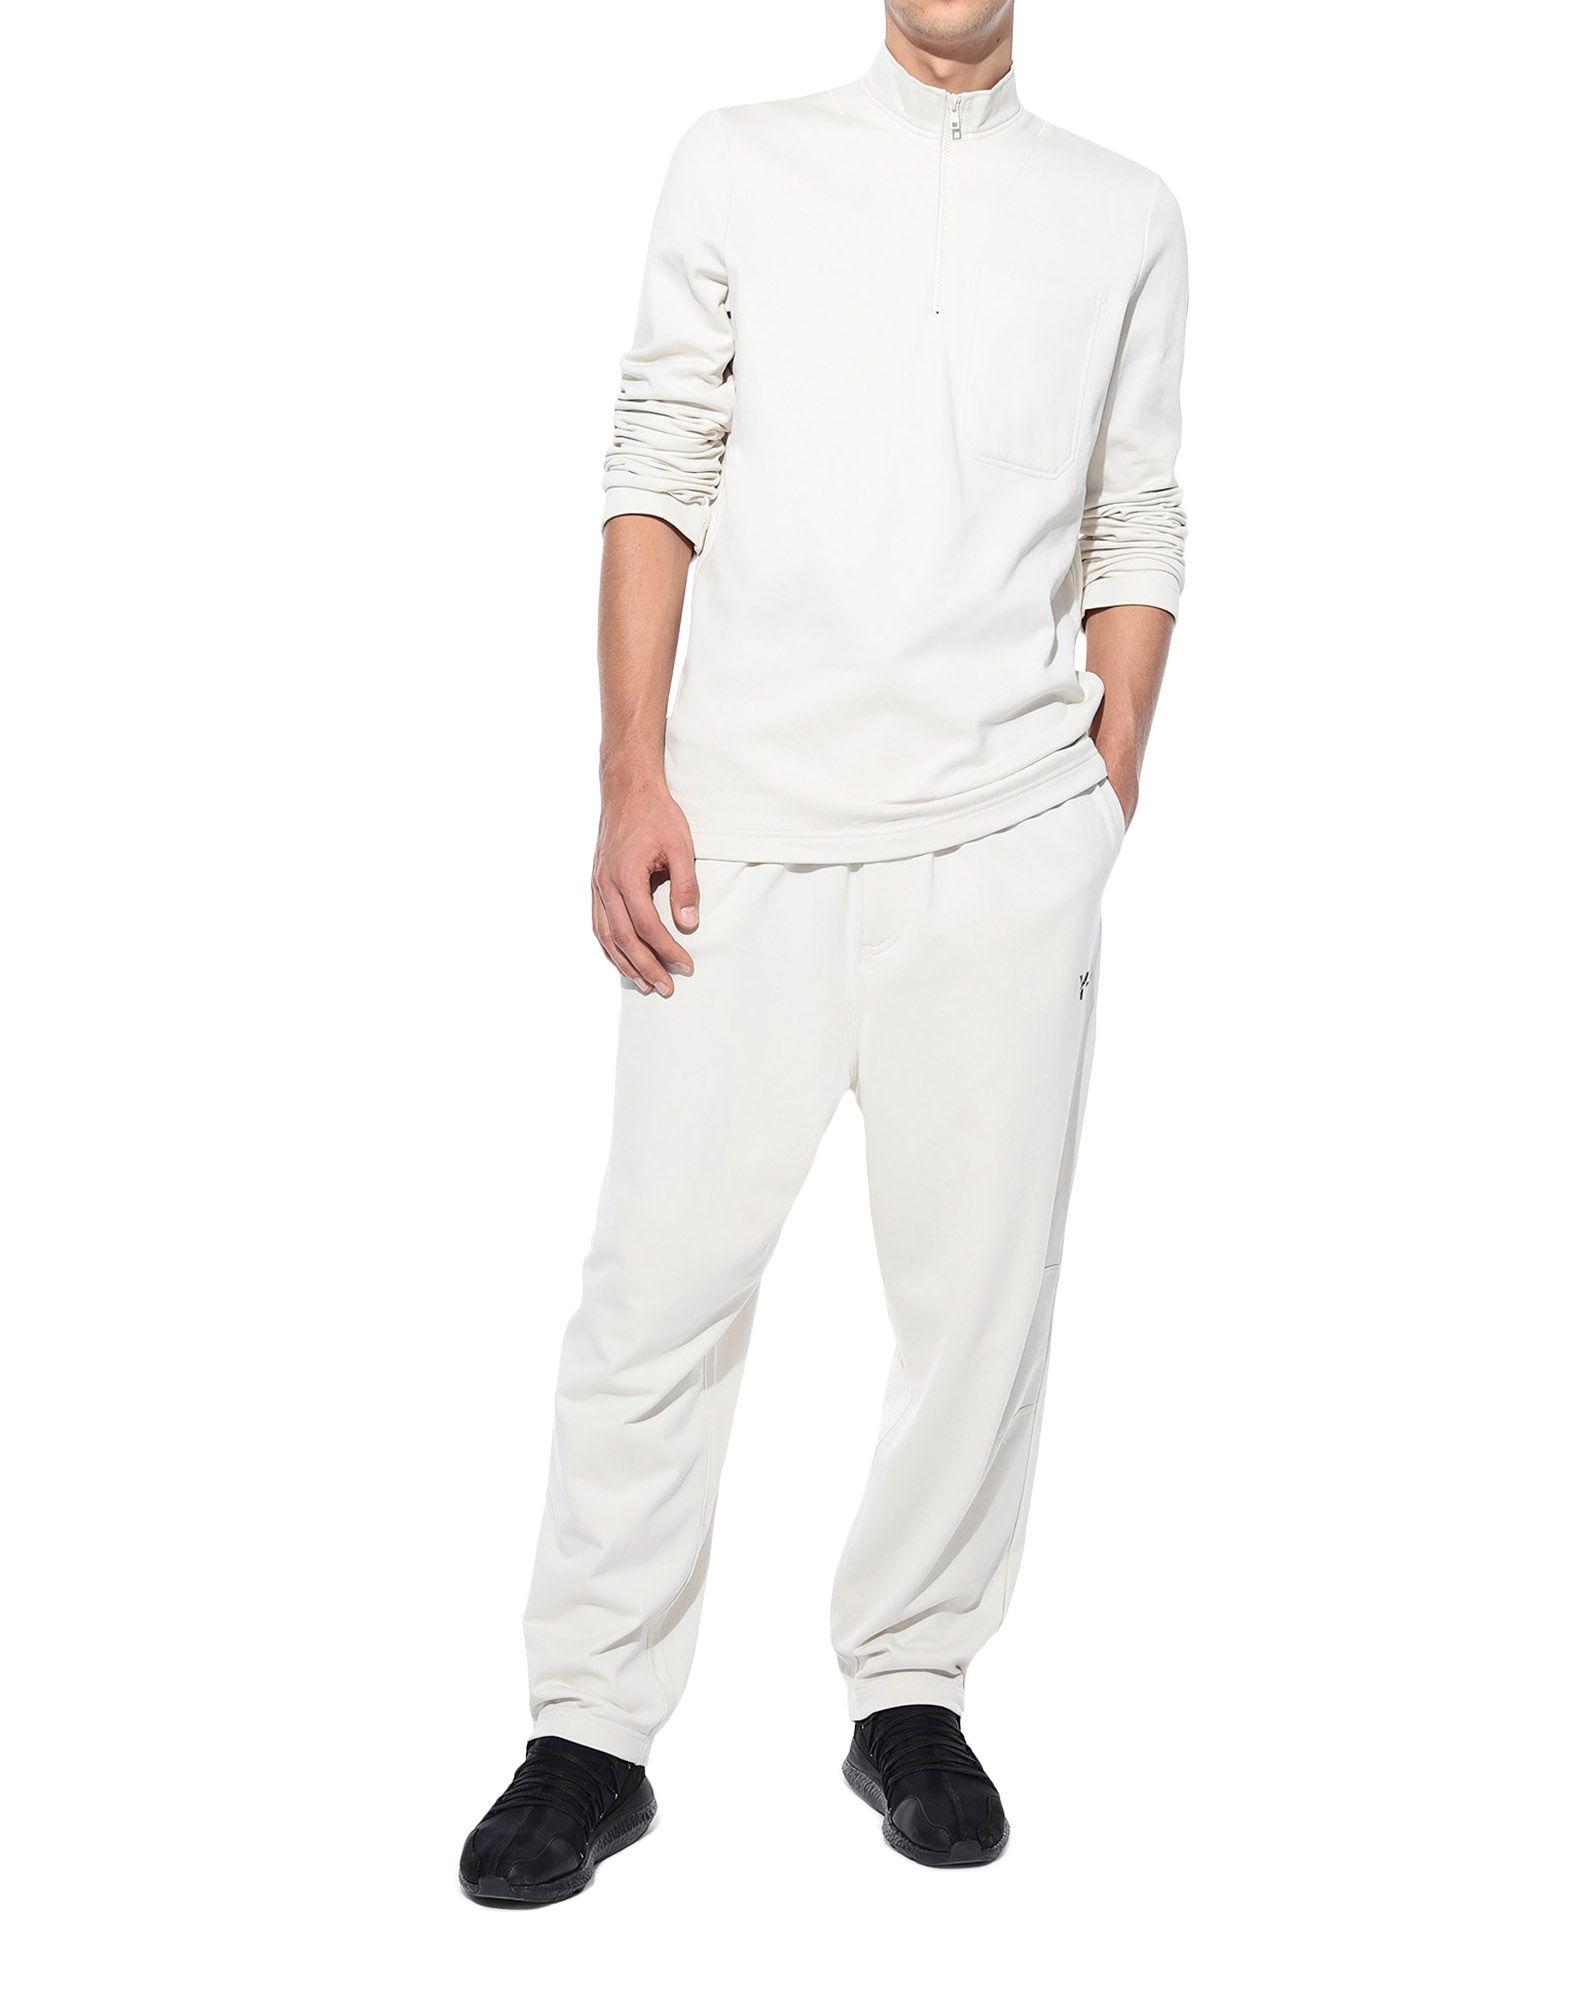 Y-3 Y-3 Sashiko Pants Sweatpants Man a